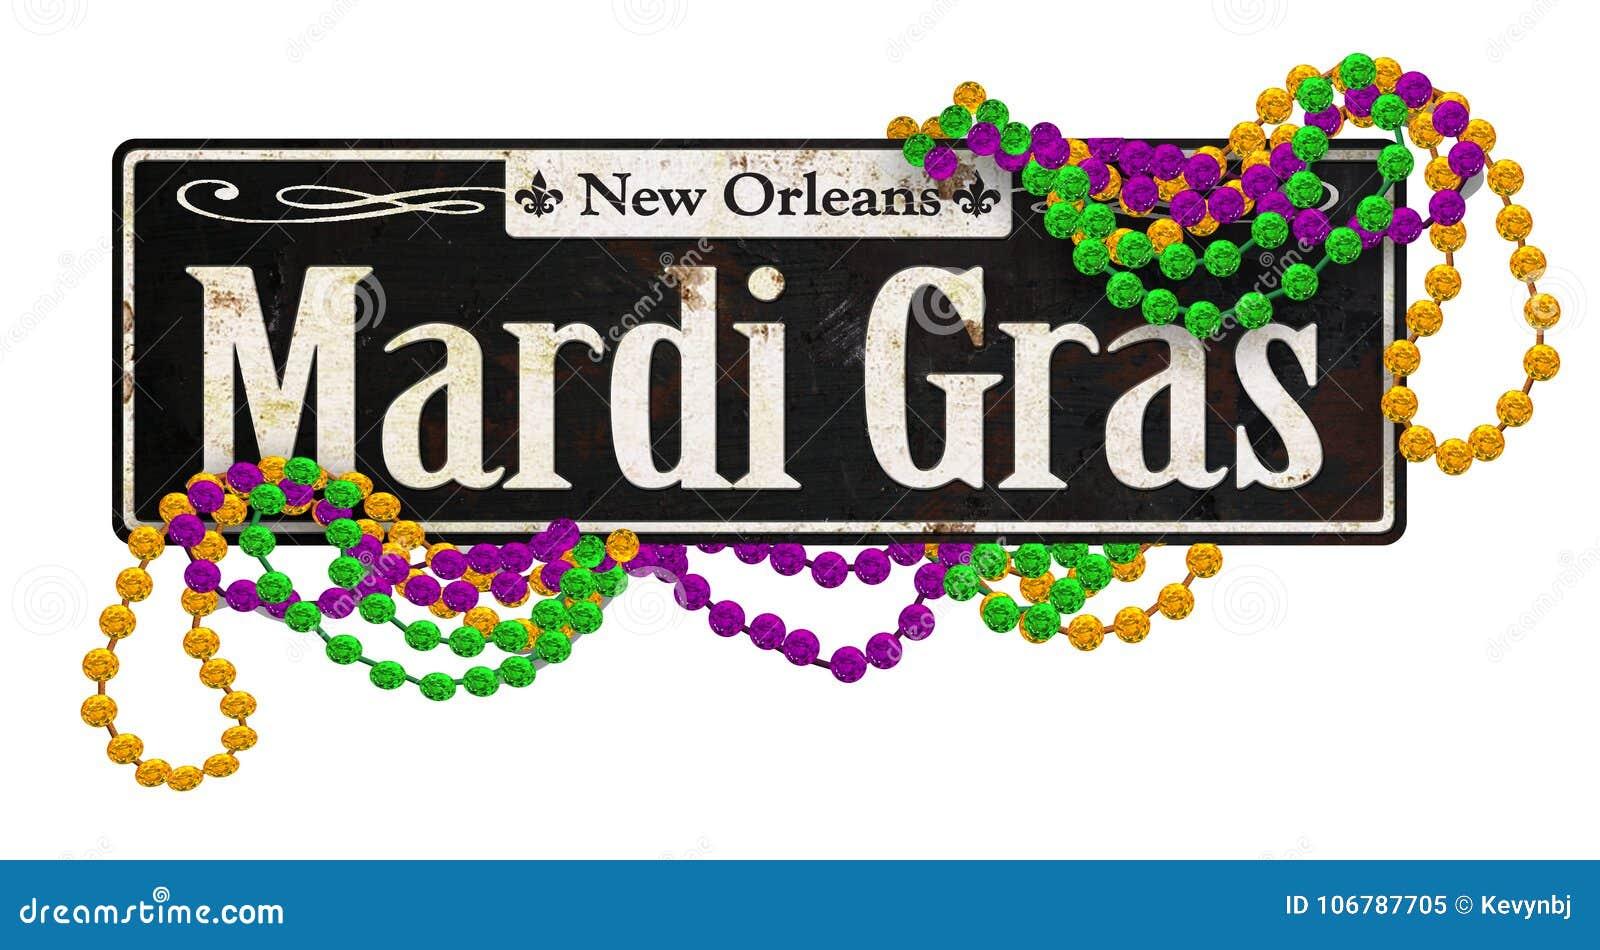 mardi gras rustic vintage street signs retro stock image image of rh dreamstime com new orleans french quarter clip art New Orleans Clip Art